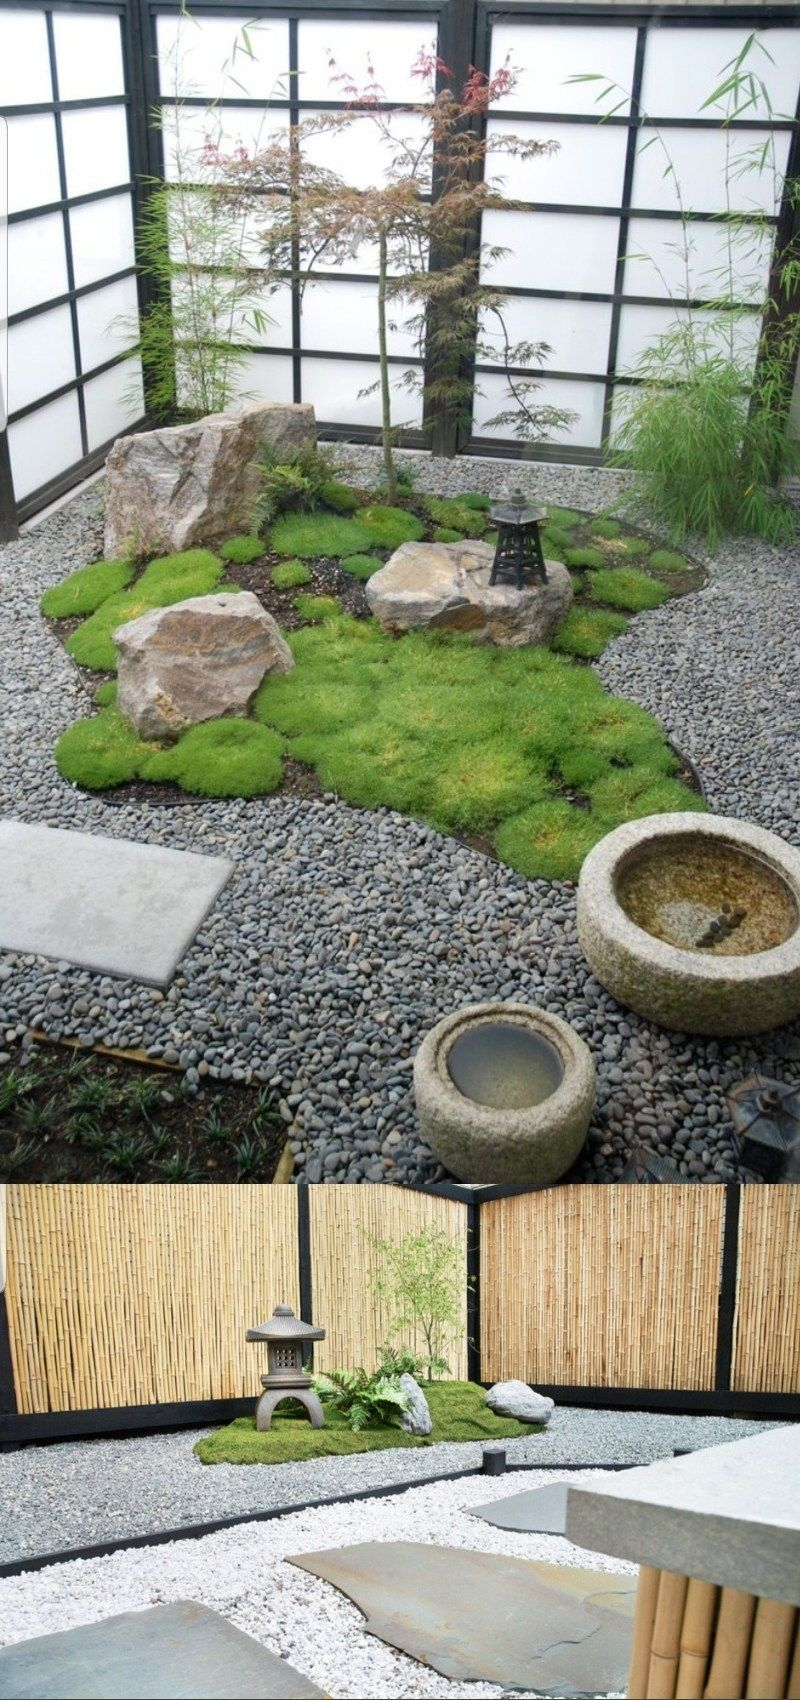 21 Beautiful Zen Garden Ideas 2019 Zengarden Miniature Backyard Diy Landscape Indoor Zen Garden Japanese Rock Garden Japanese Garden Design